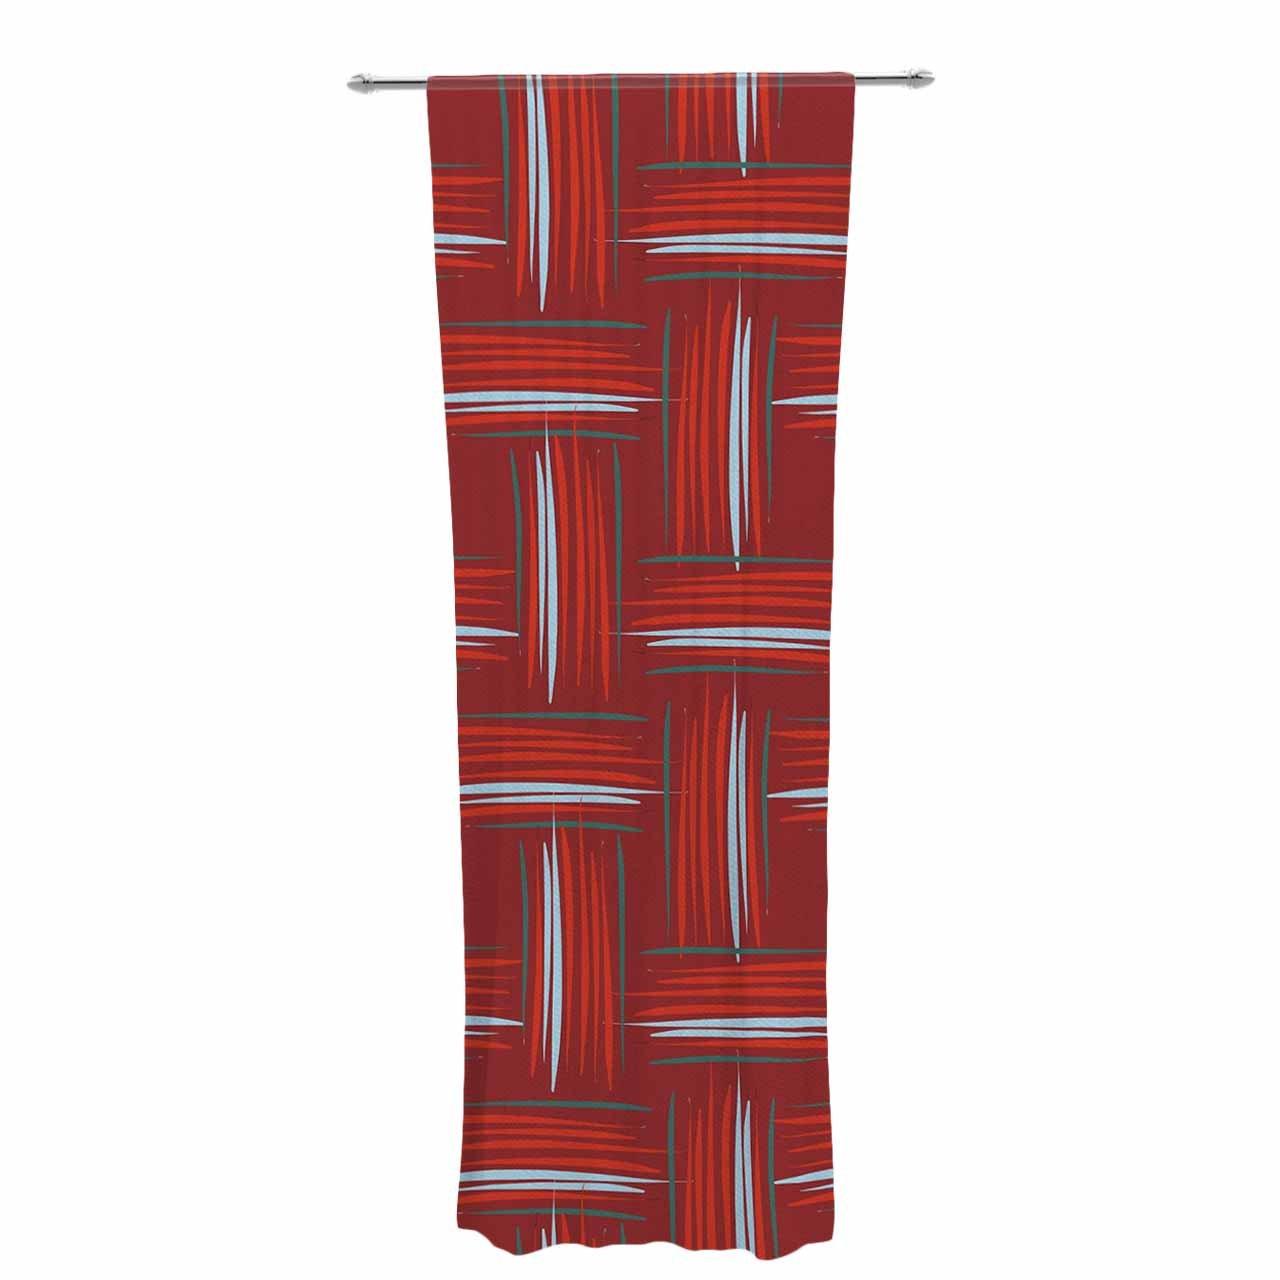 30 x 84 Sheer Curtains Kess InHouse Empire Ruhl Rust Crosshatch Red Blue Digital Decorative Set